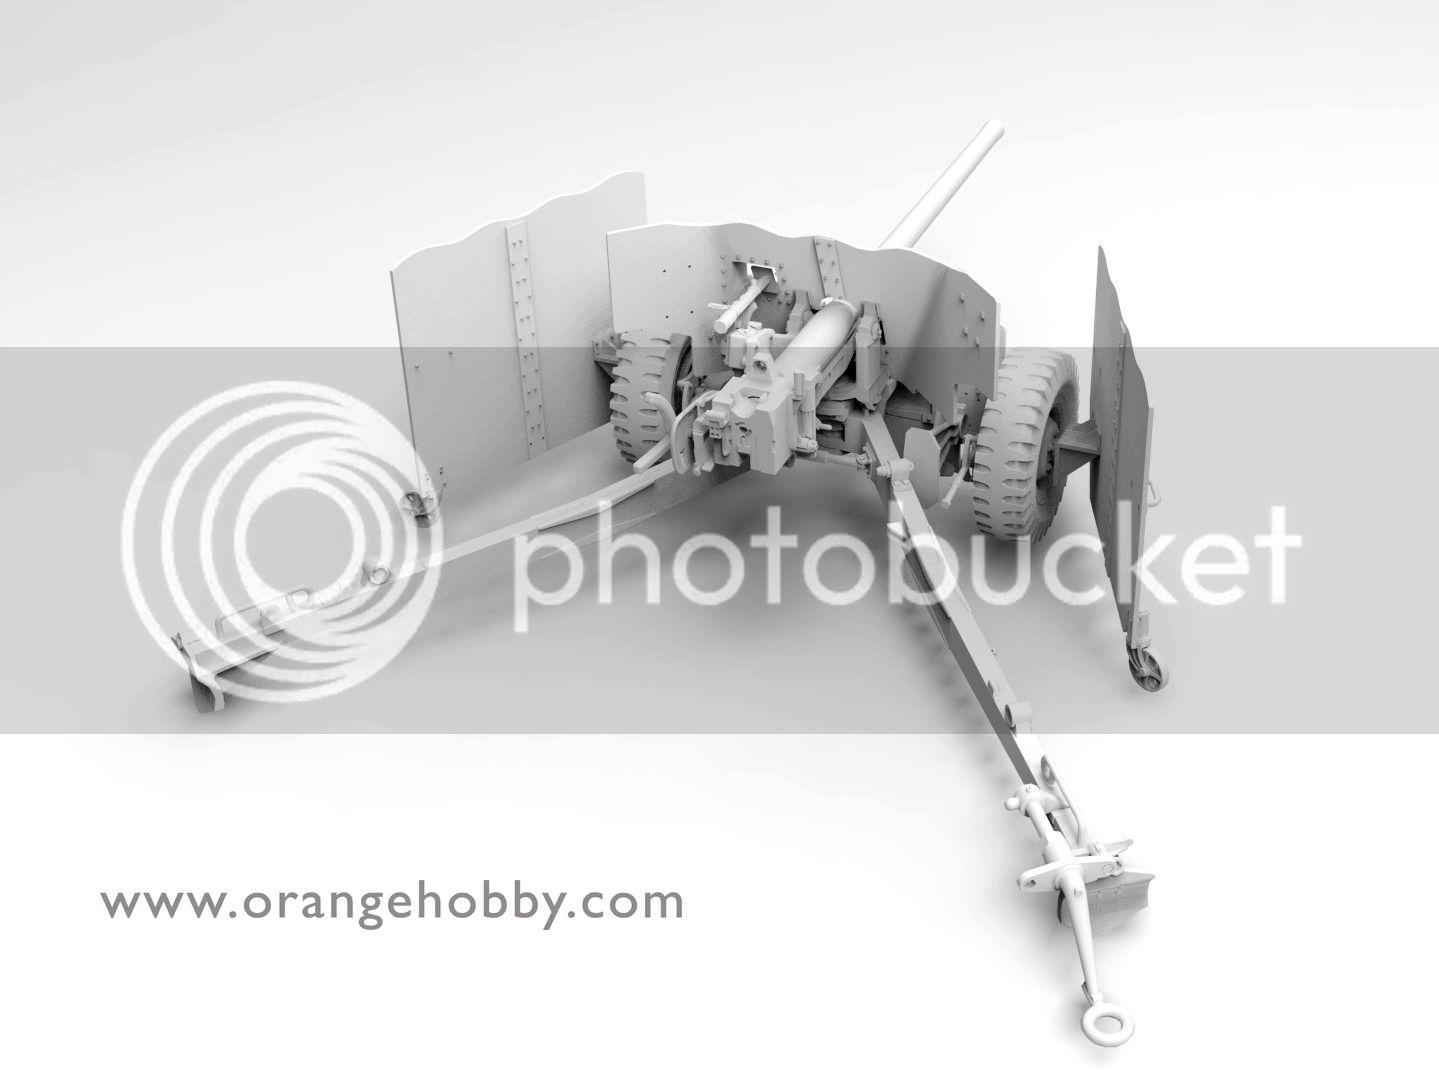 News from Orange Hobbies 57mm-02